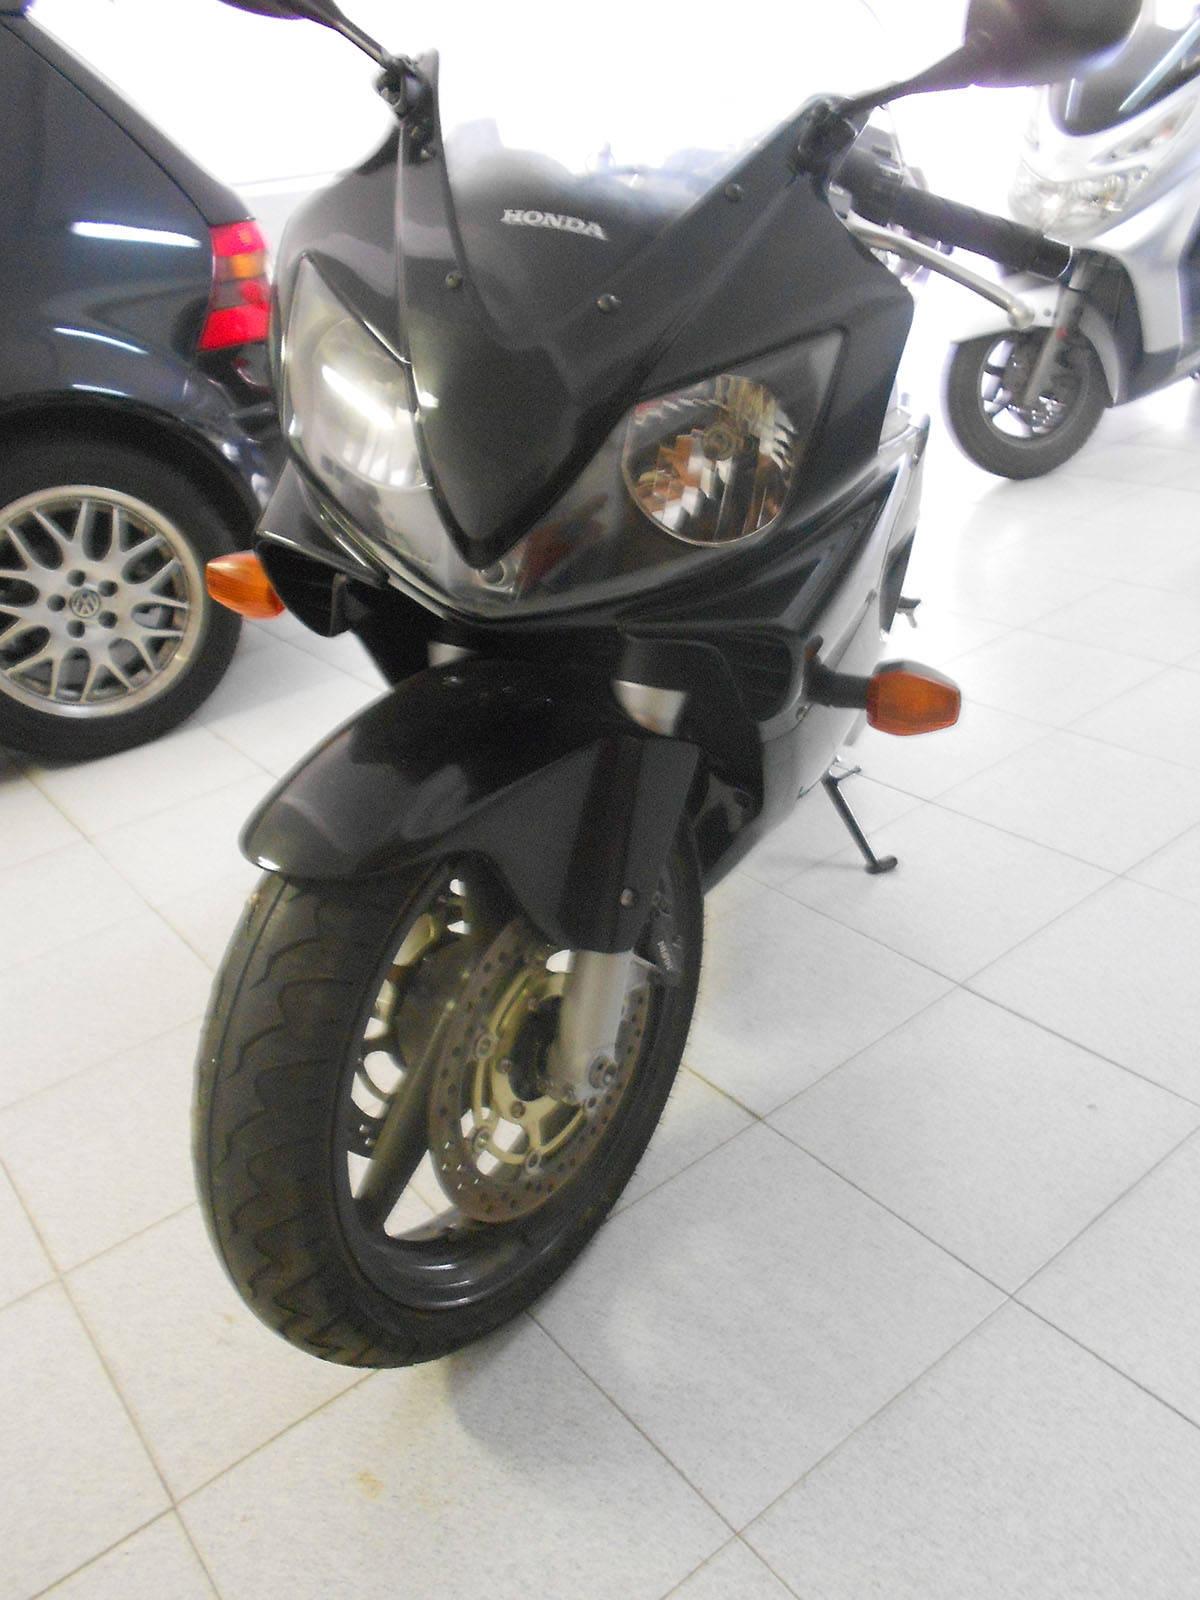 Honda CBR 600 F impecable 14.000kmts  - Foto 3